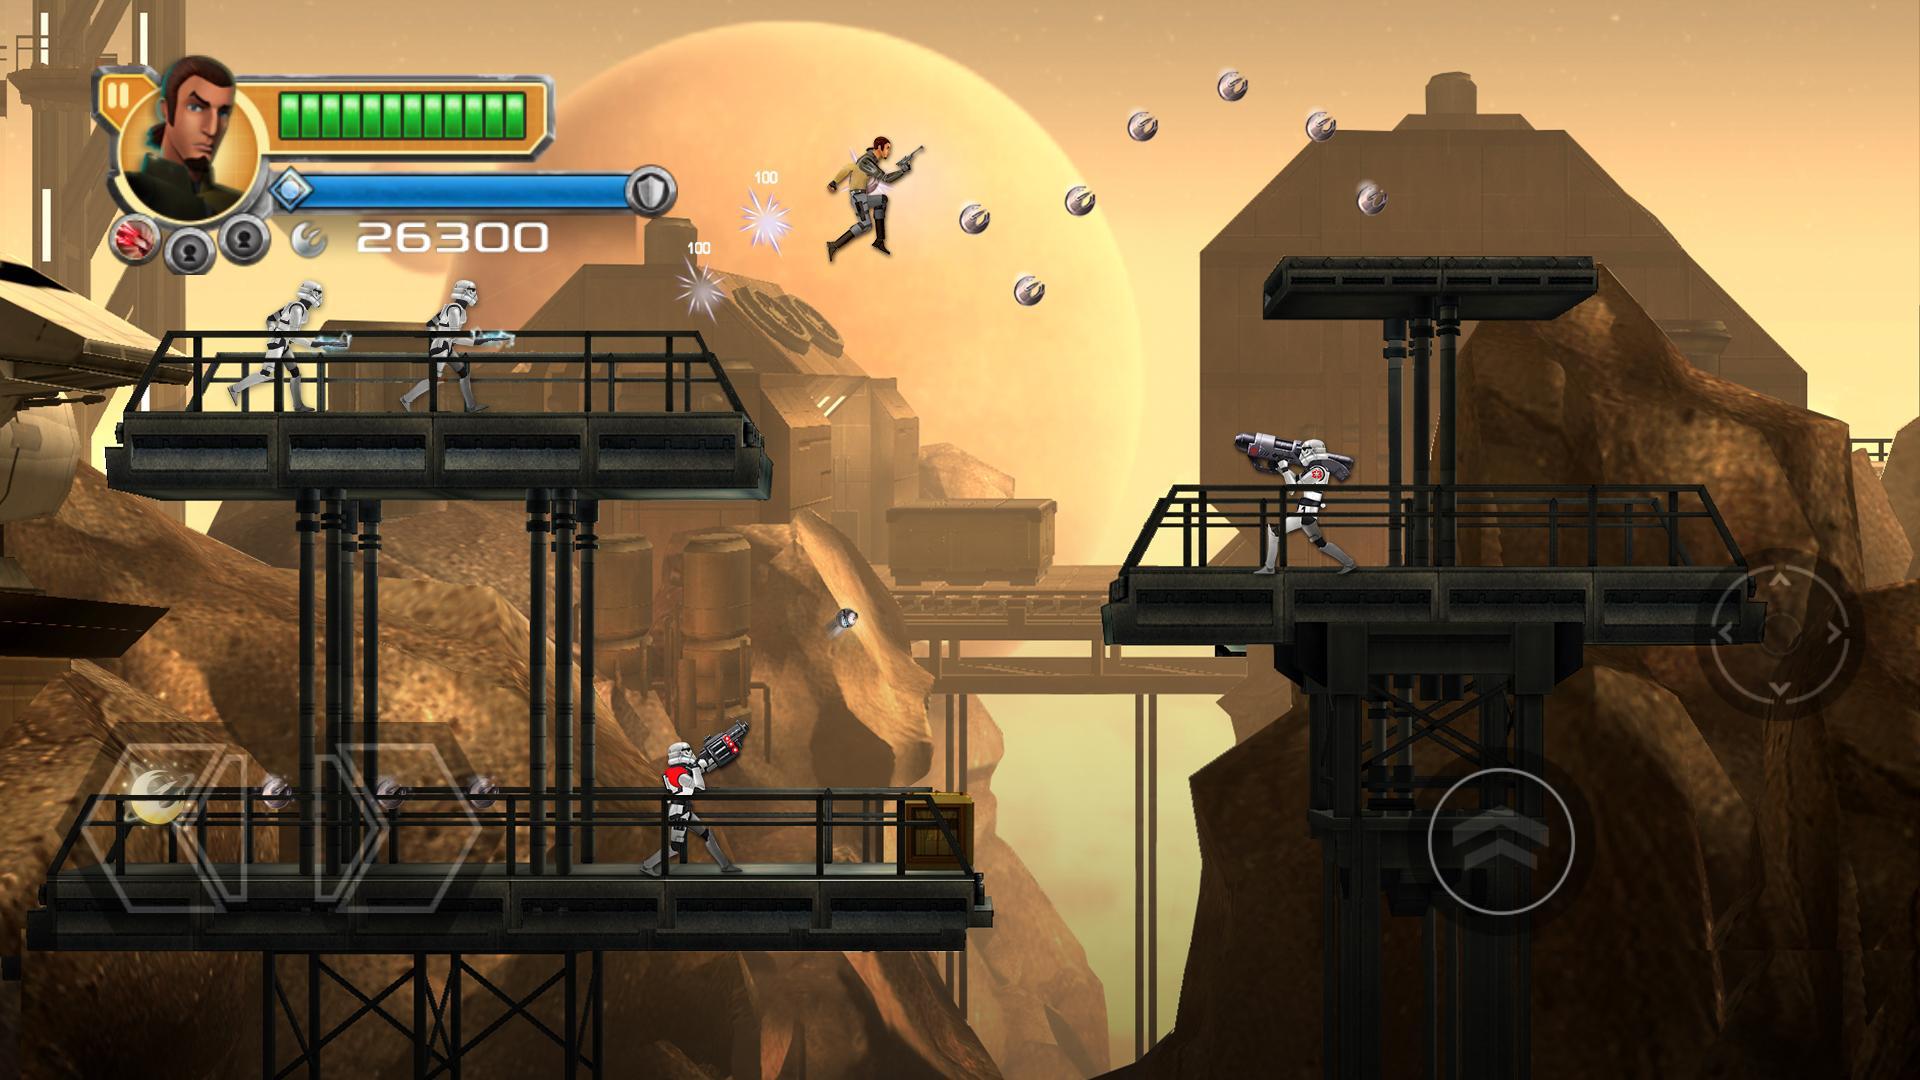 Star Wars Rebels: Missions screenshot #6